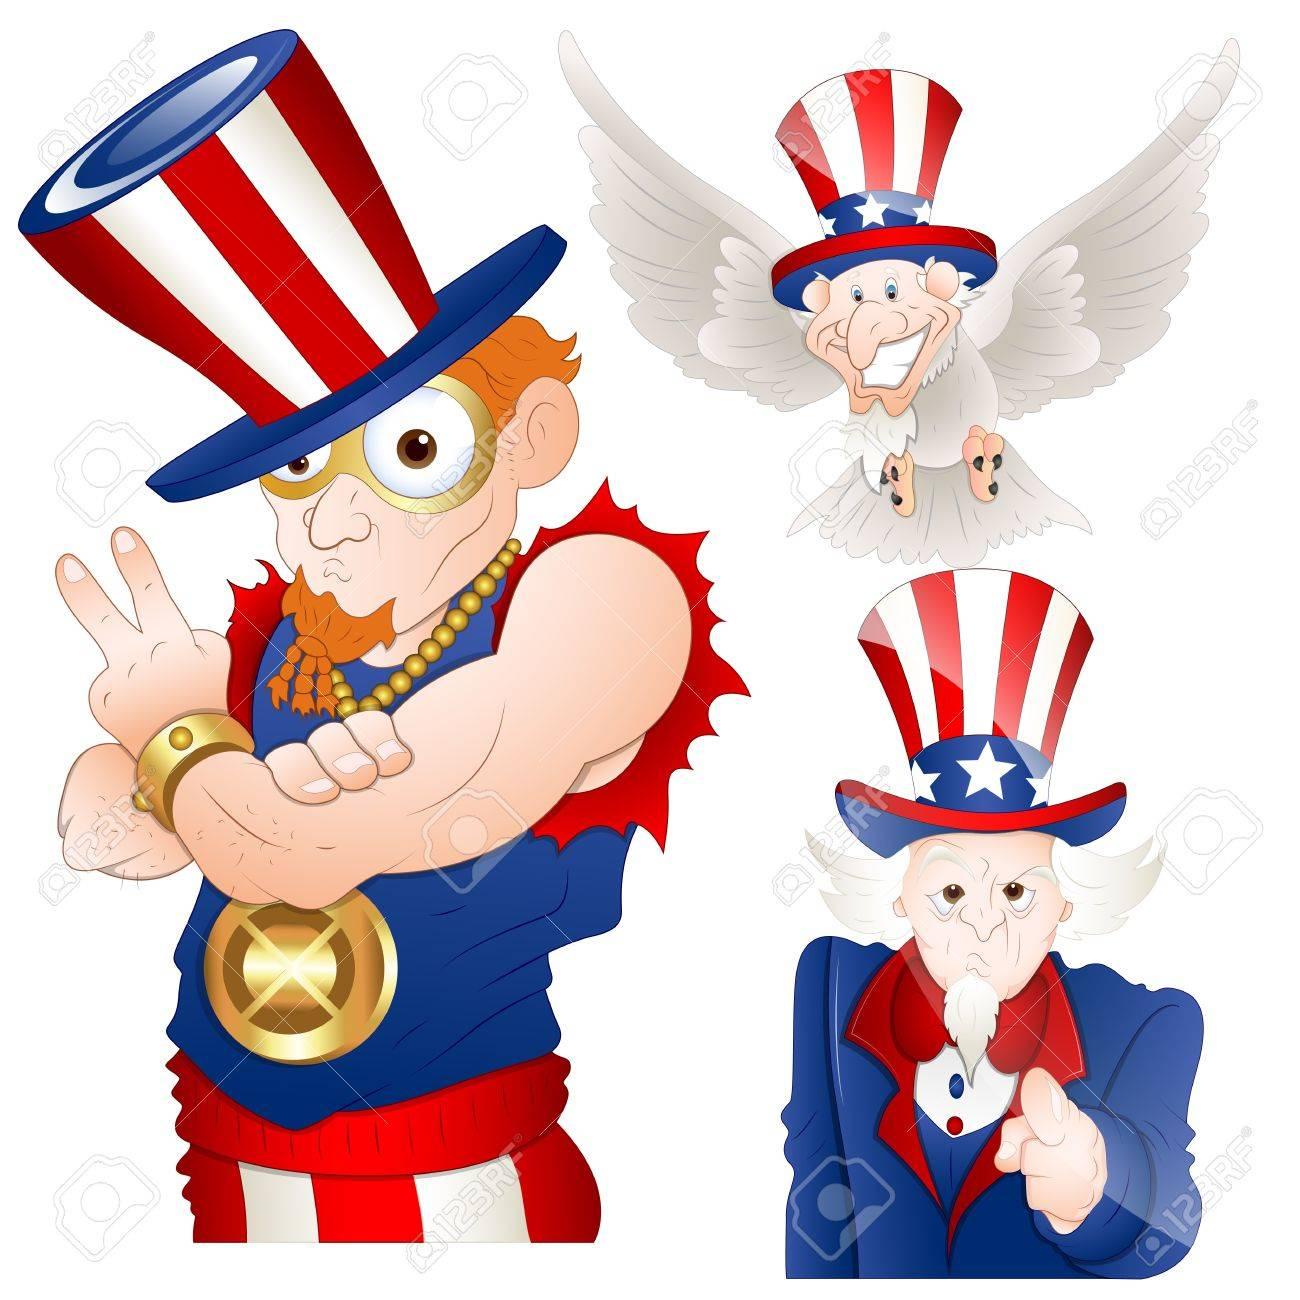 Uncle Sam Vector Illustration Stock Vector - 12861139